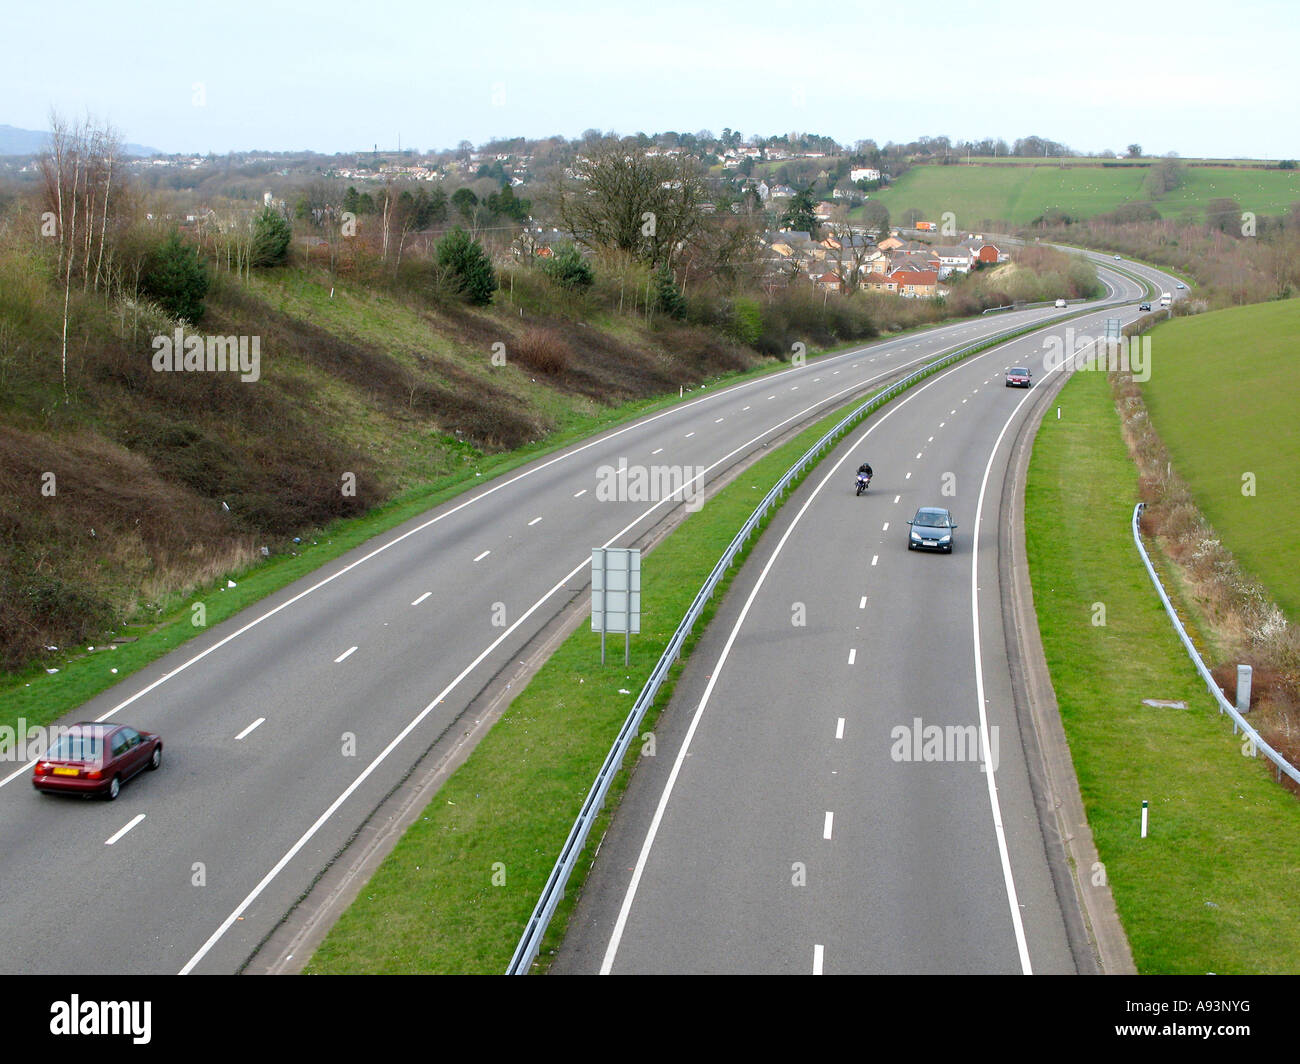 A4042 dual carriageway near Newport South Wales UK - Stock Image